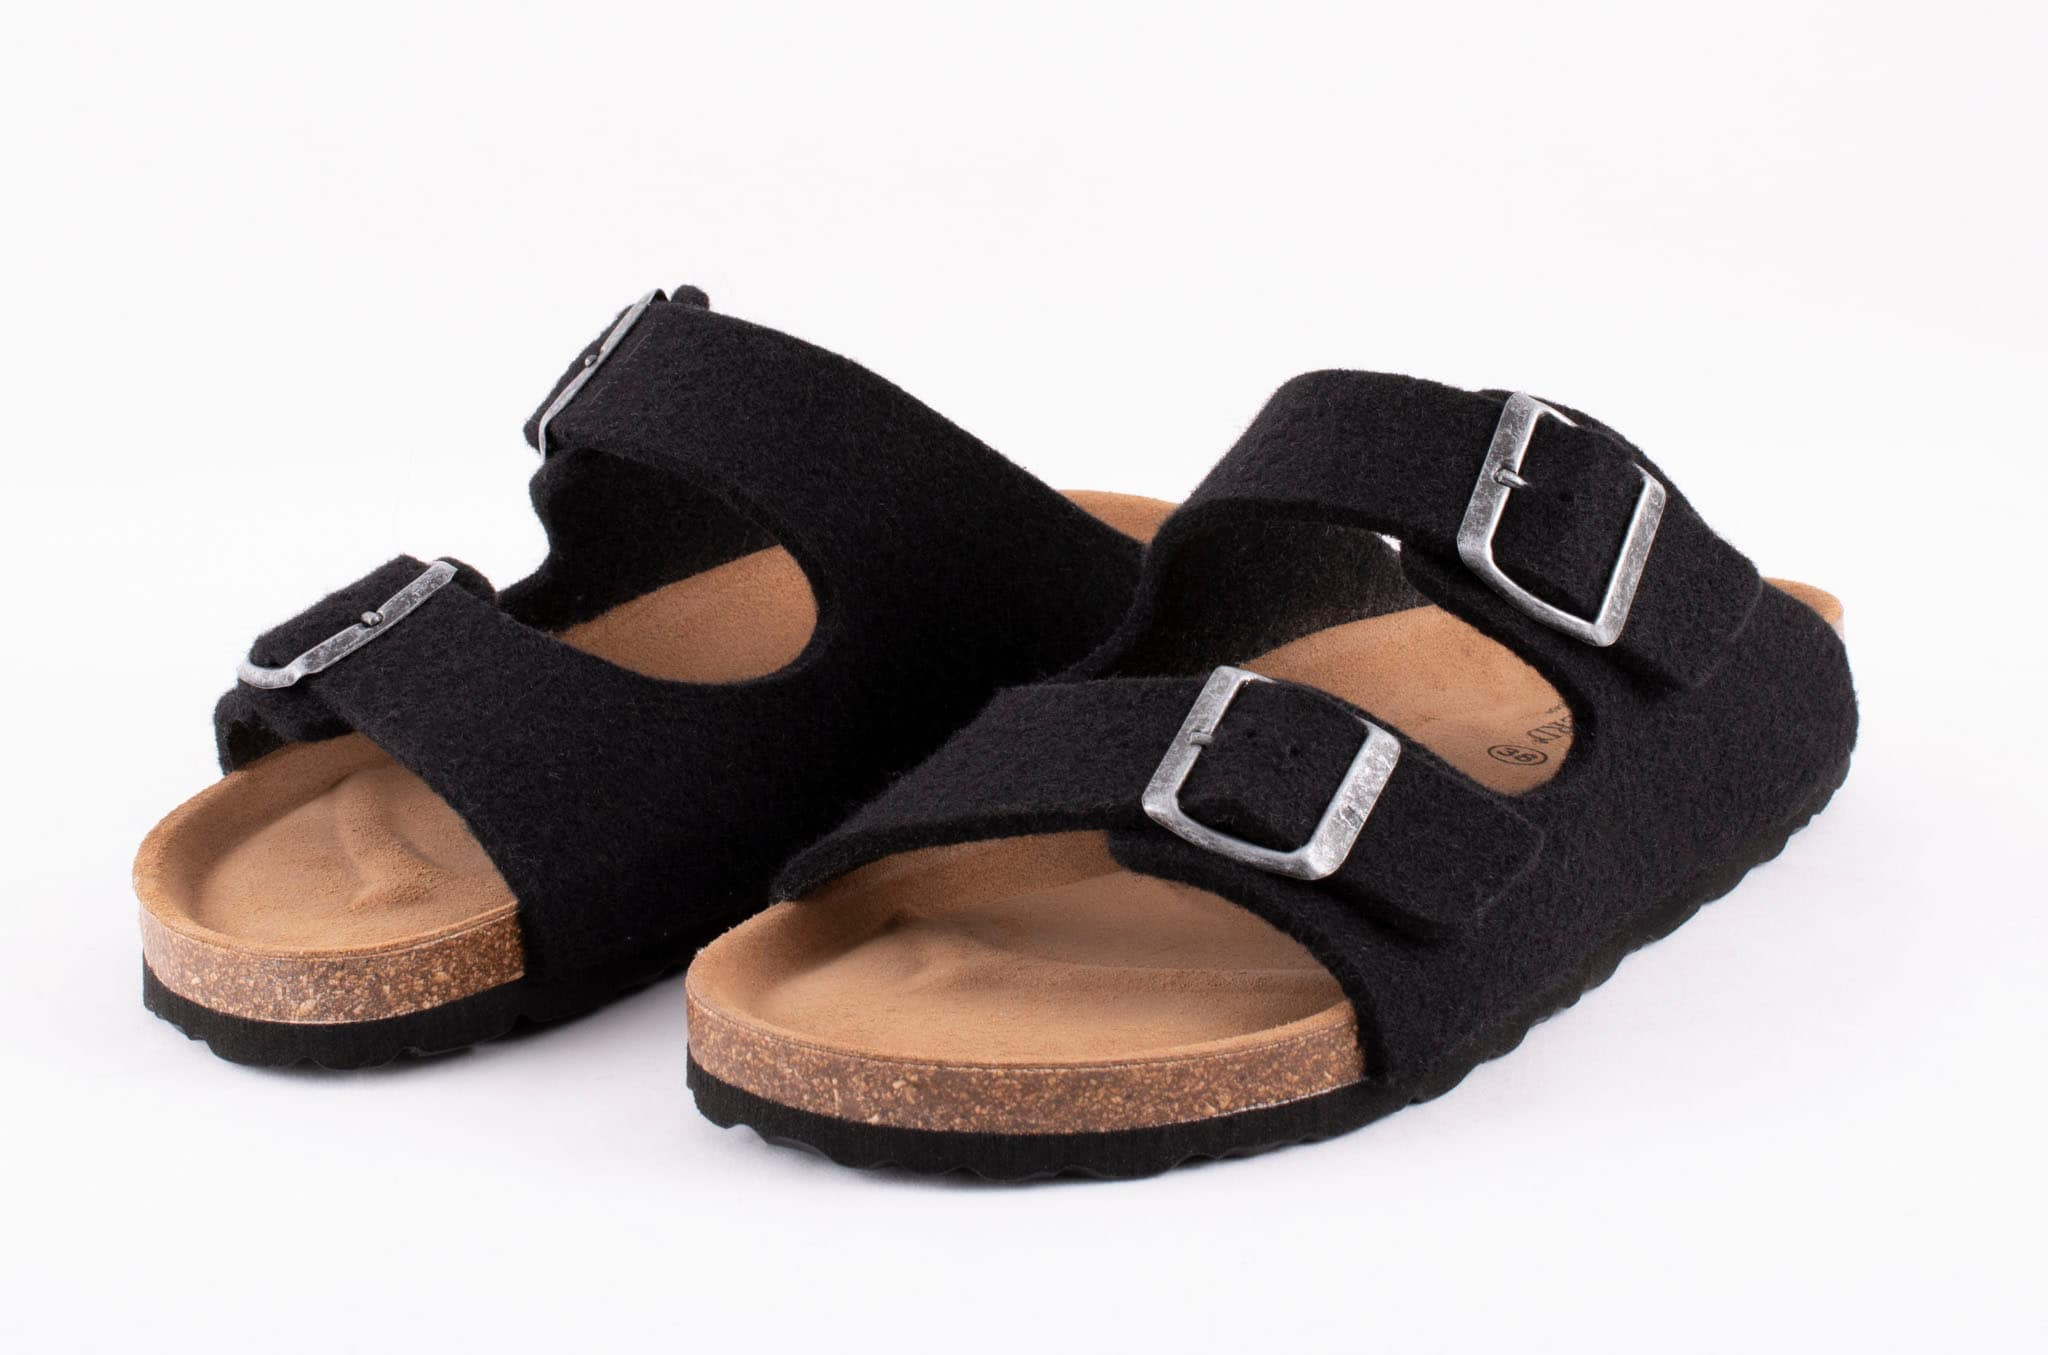 Shepherd Cassandra sandals